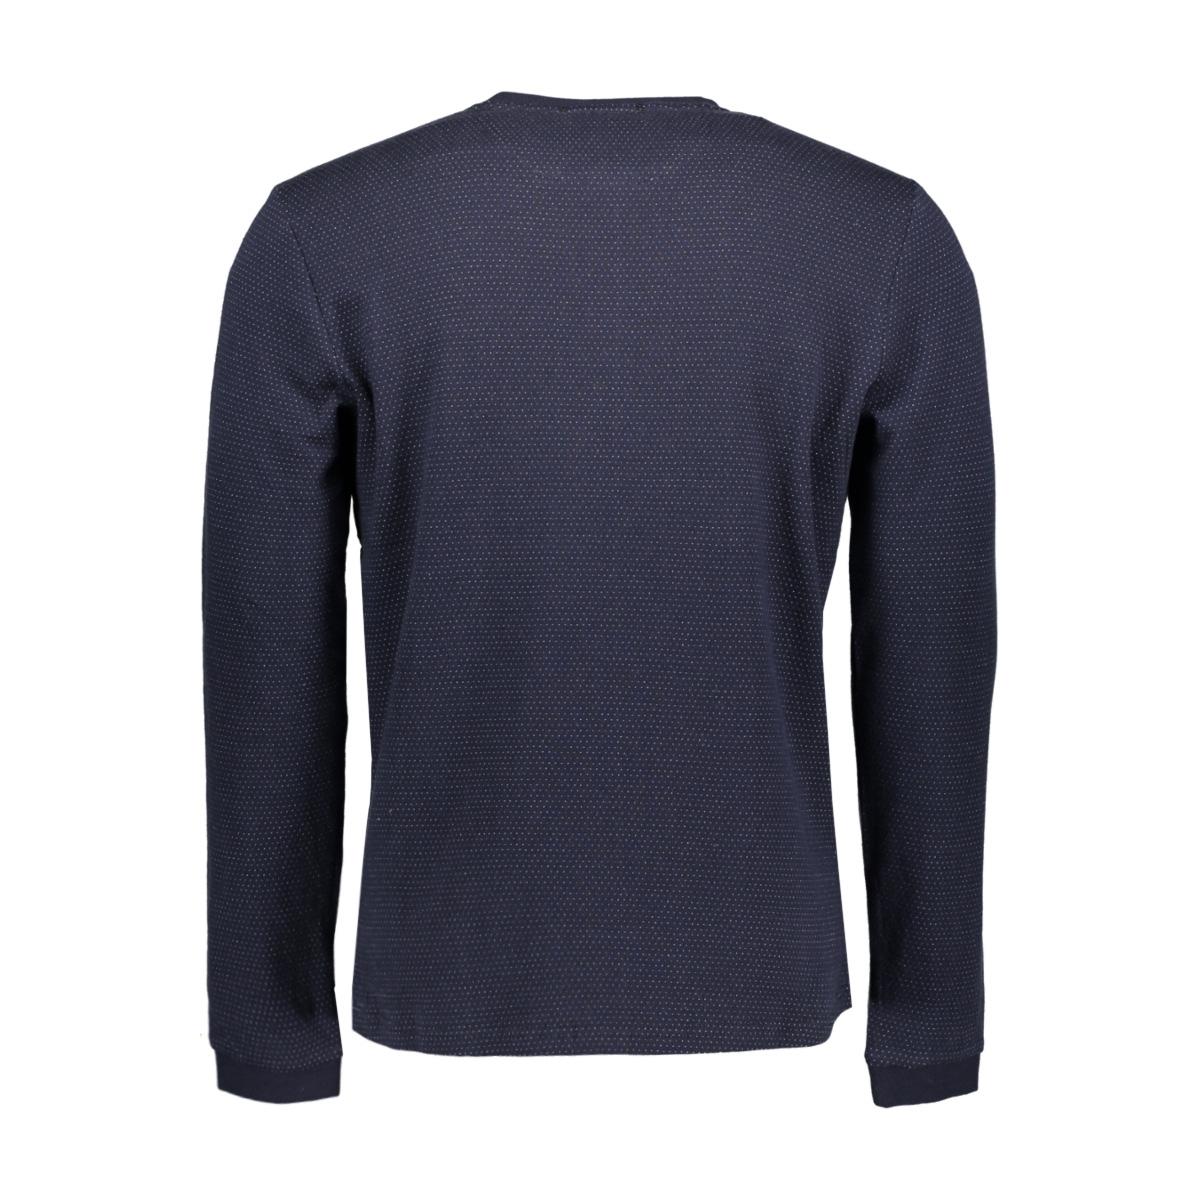 82120801 no-excess t-shirt 078 night